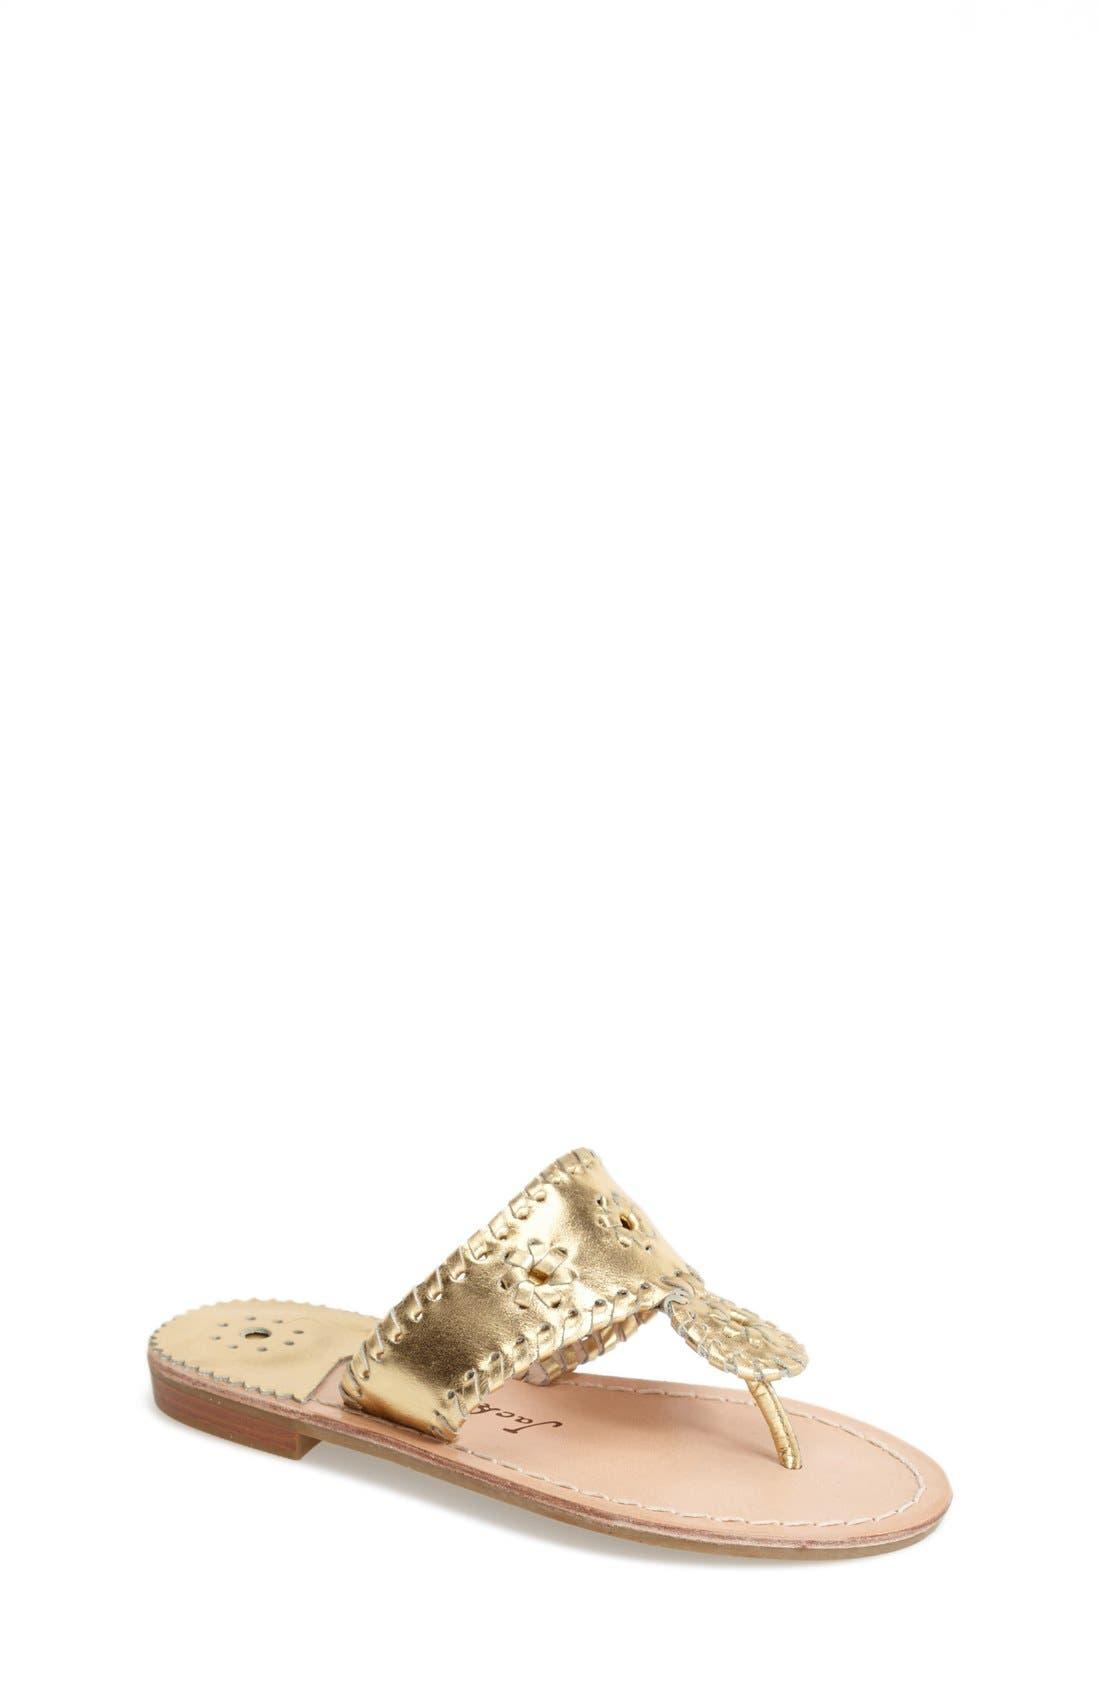 'Miss Hamptons' Sandal,                         Main,                         color, GOLD